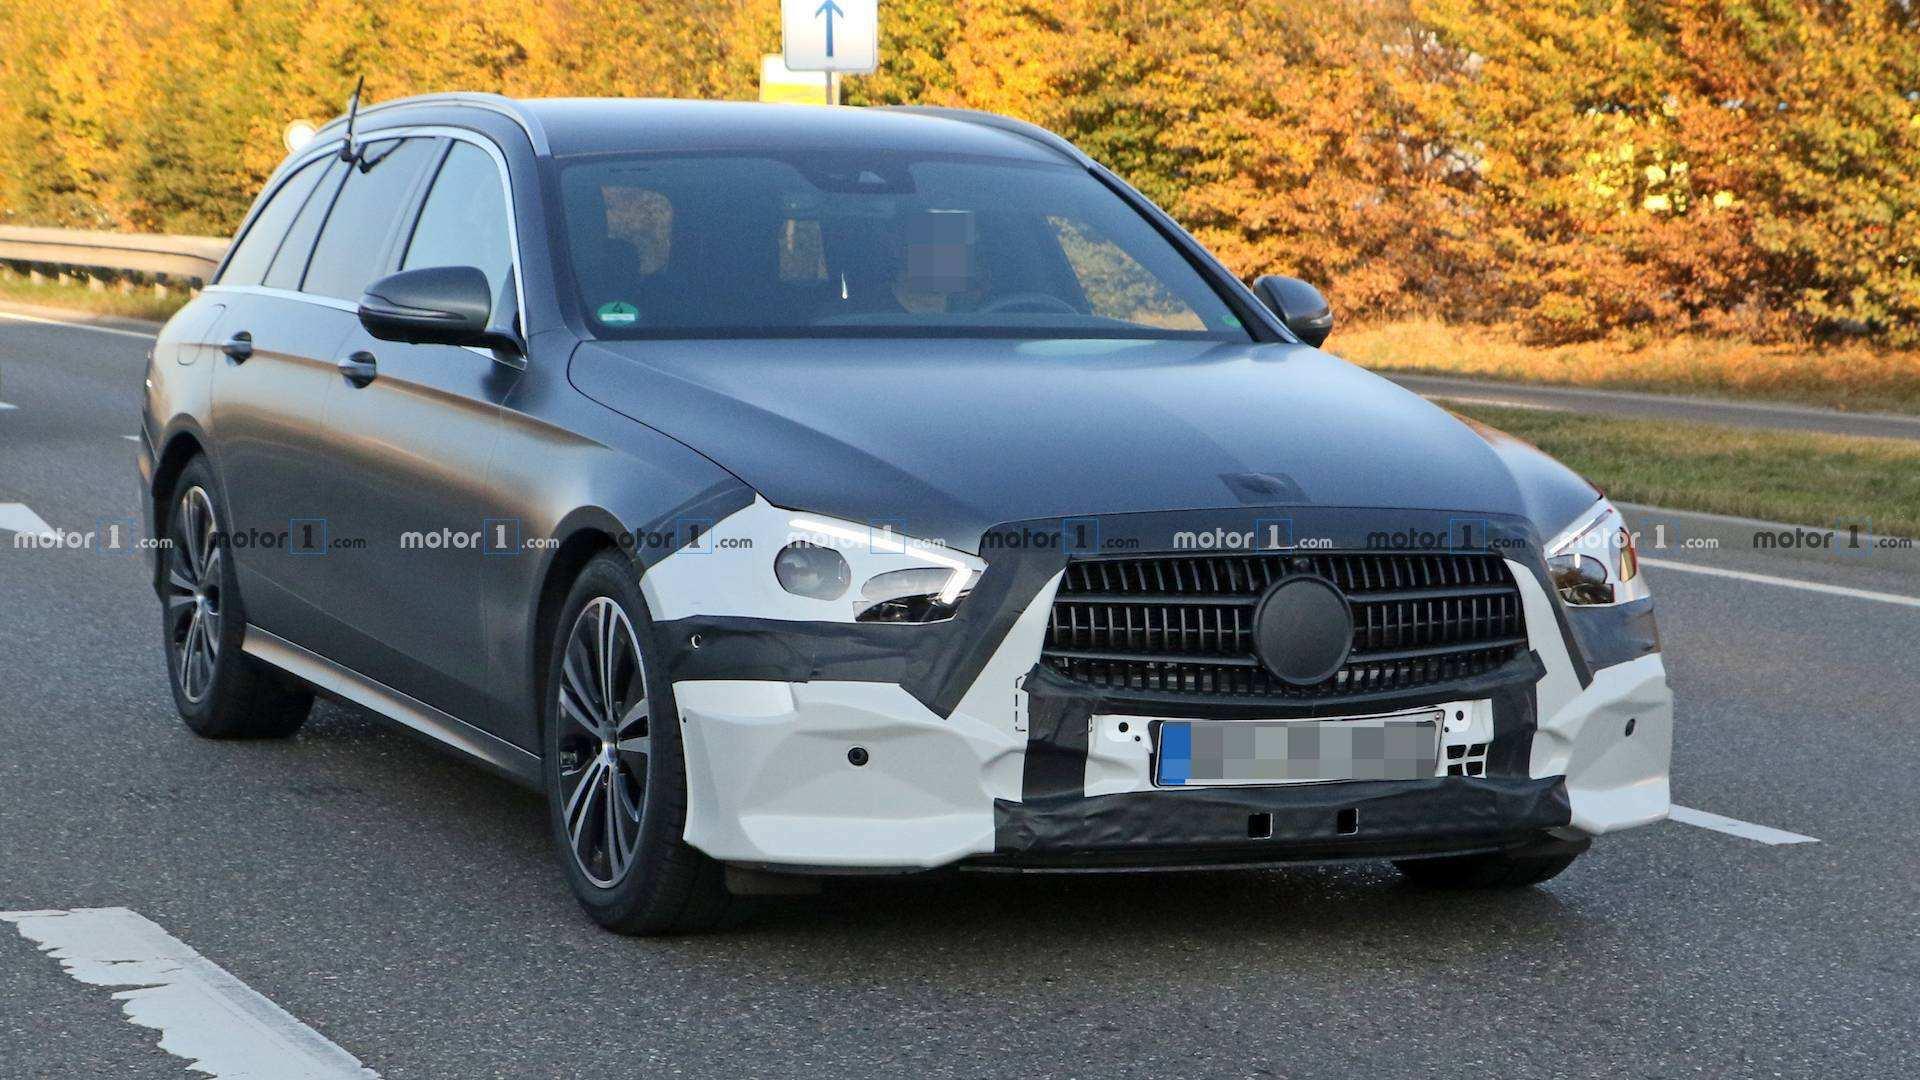 20 All New 2020 Mercedes E Class Picture by 2020 Mercedes E Class